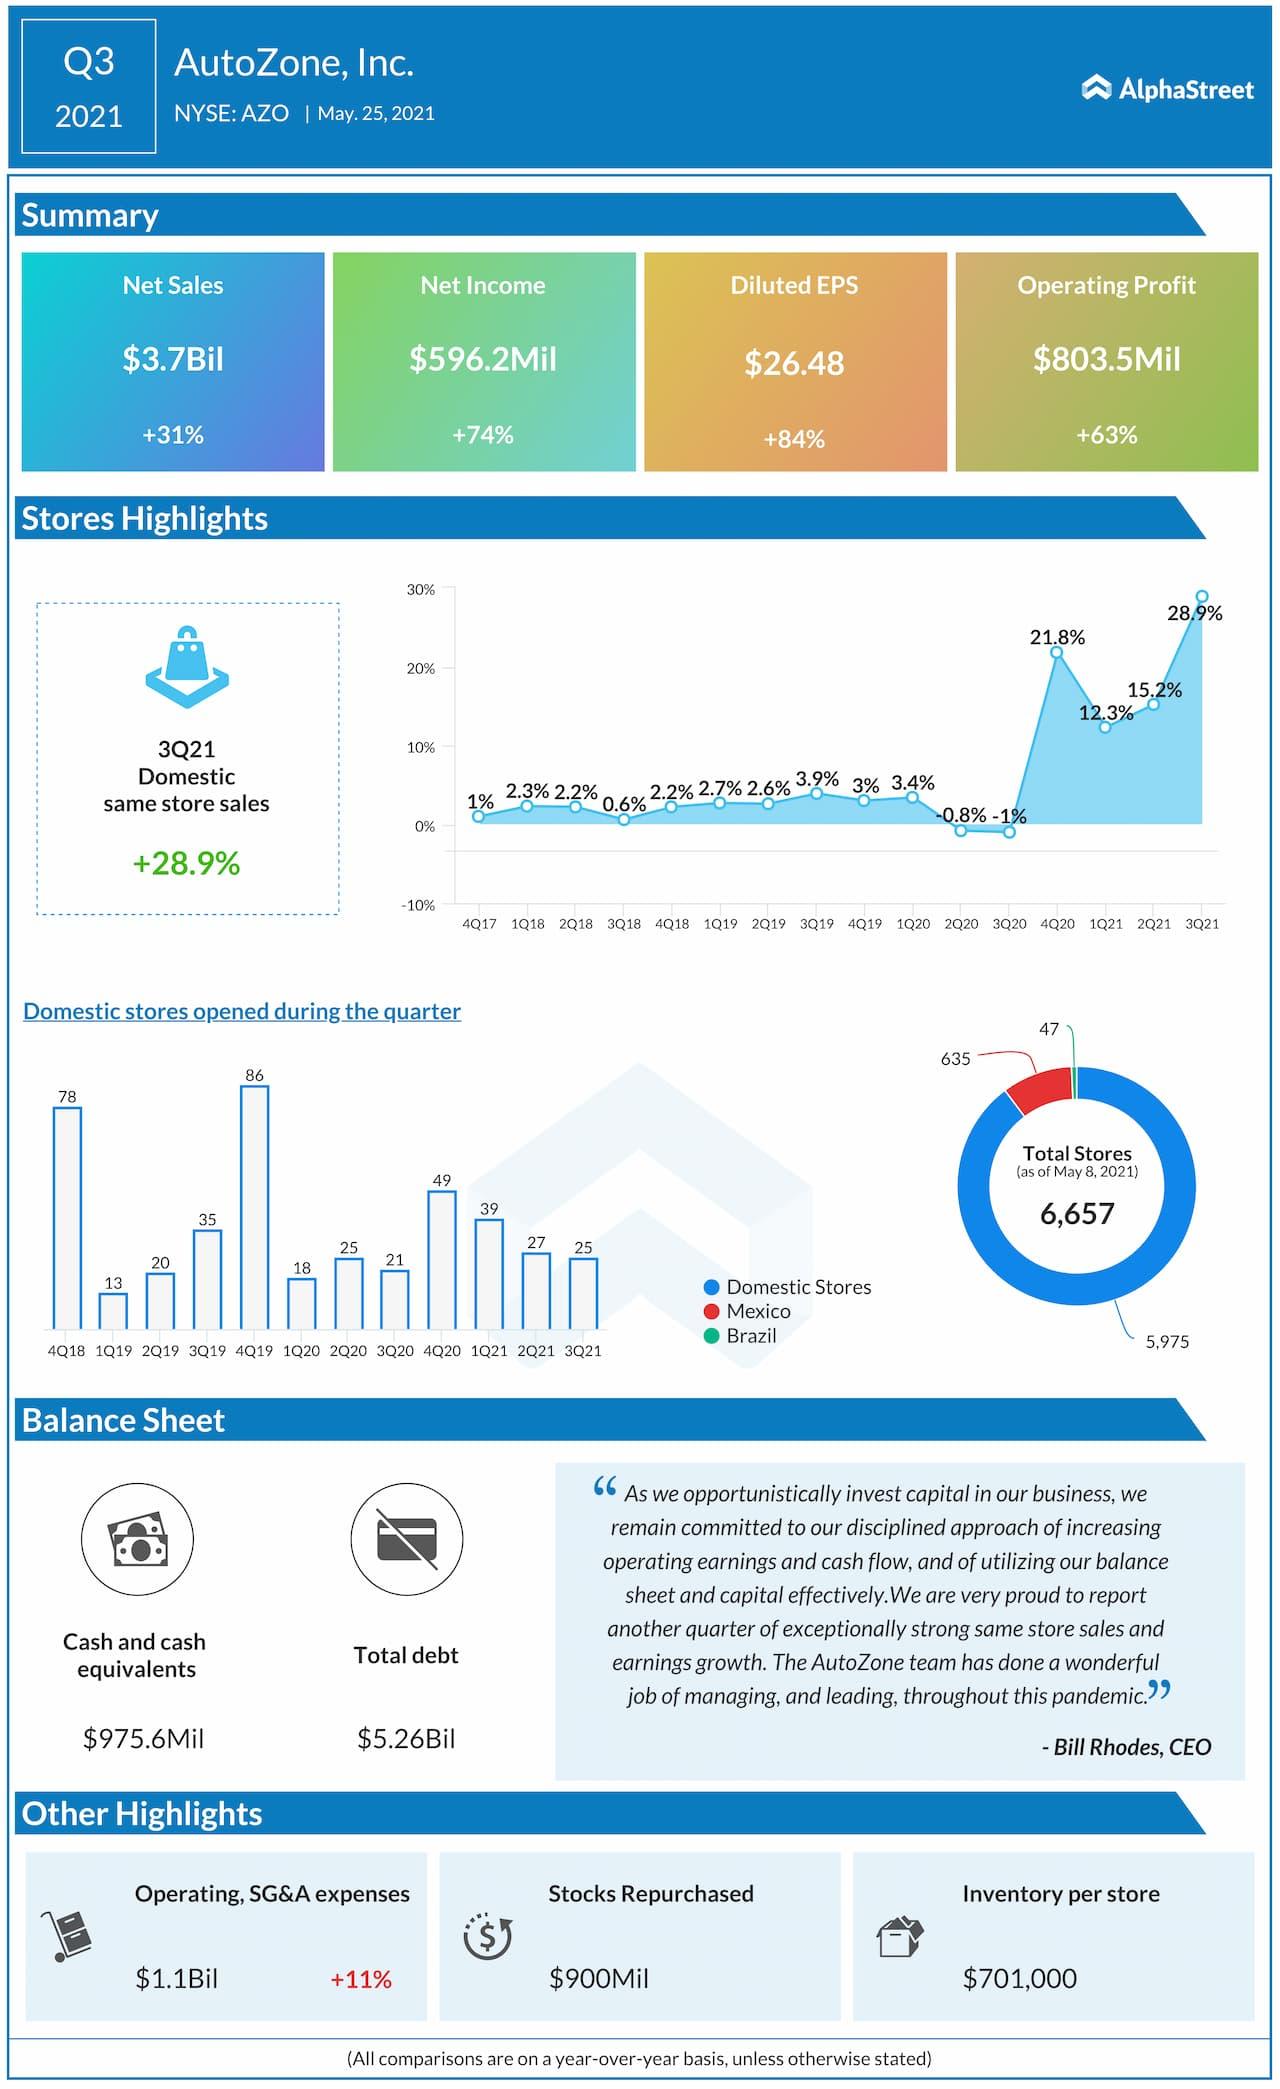 AutoZone Q3 2021 Earnings Infographic